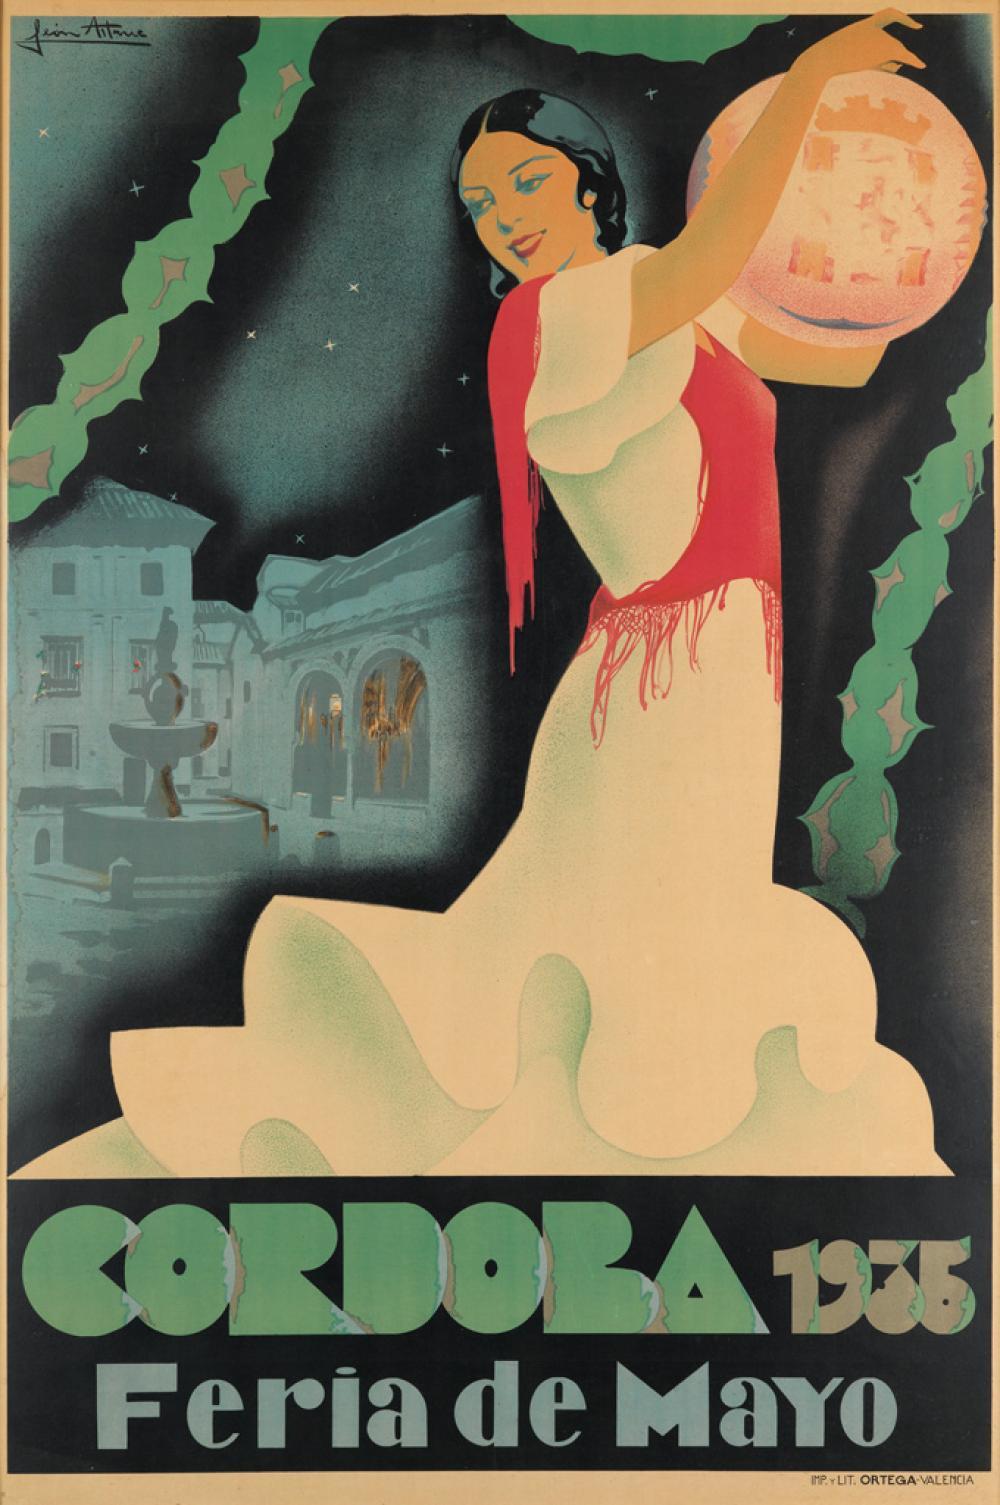 MANUEL LEÓN ASTRUC (1889-1965). CORDOBA / FERIA DE MAYO. 1935. 60x40 inches, 153x101 cm. Ortega, Valencia.